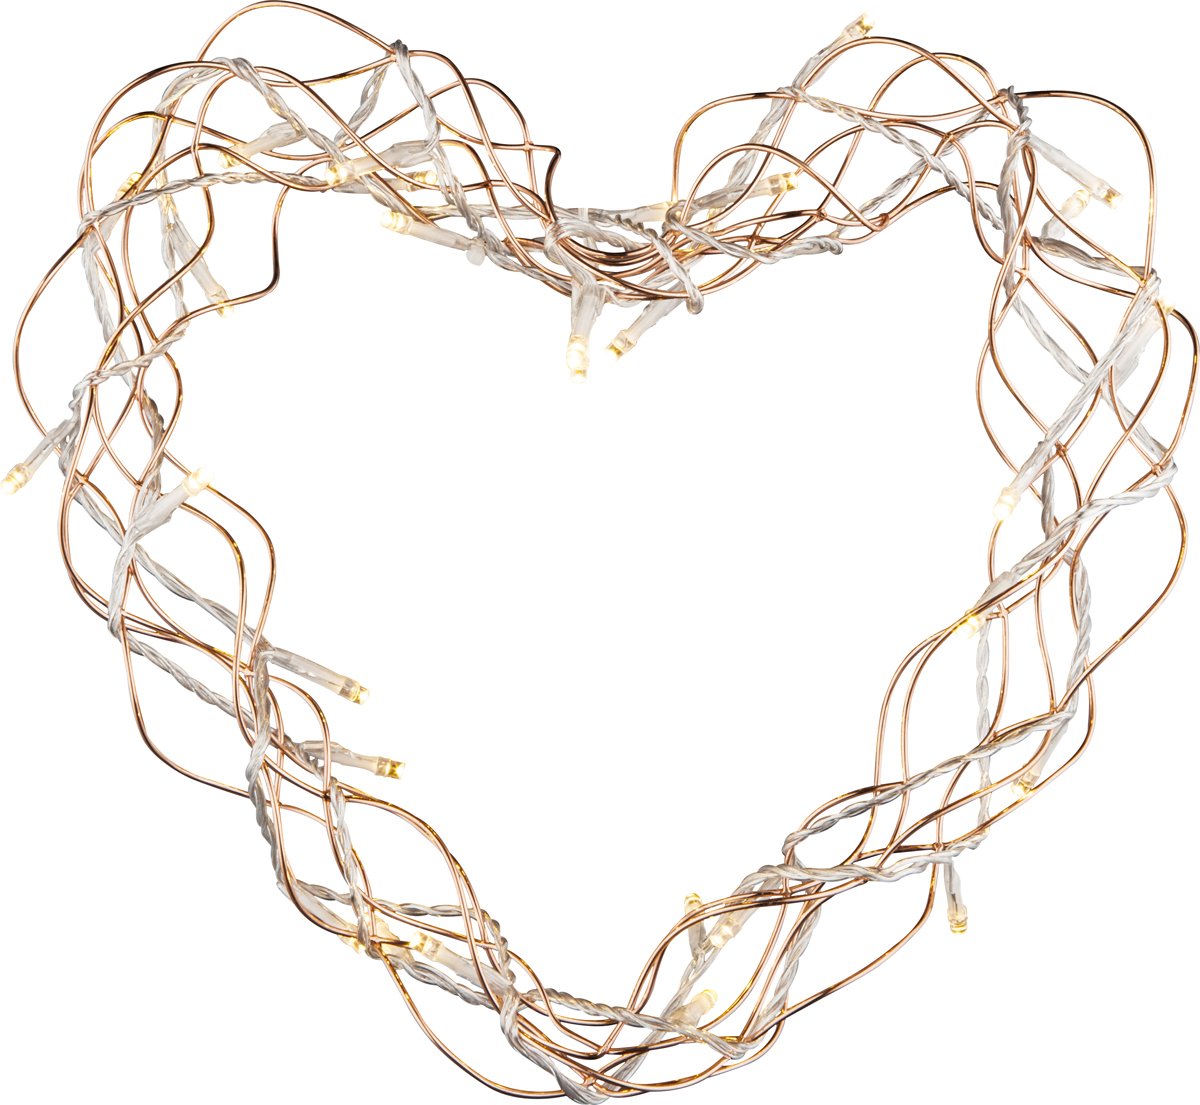 Светильник декоративный Globo Heart. 28200 декоративный светильник globo home 29981